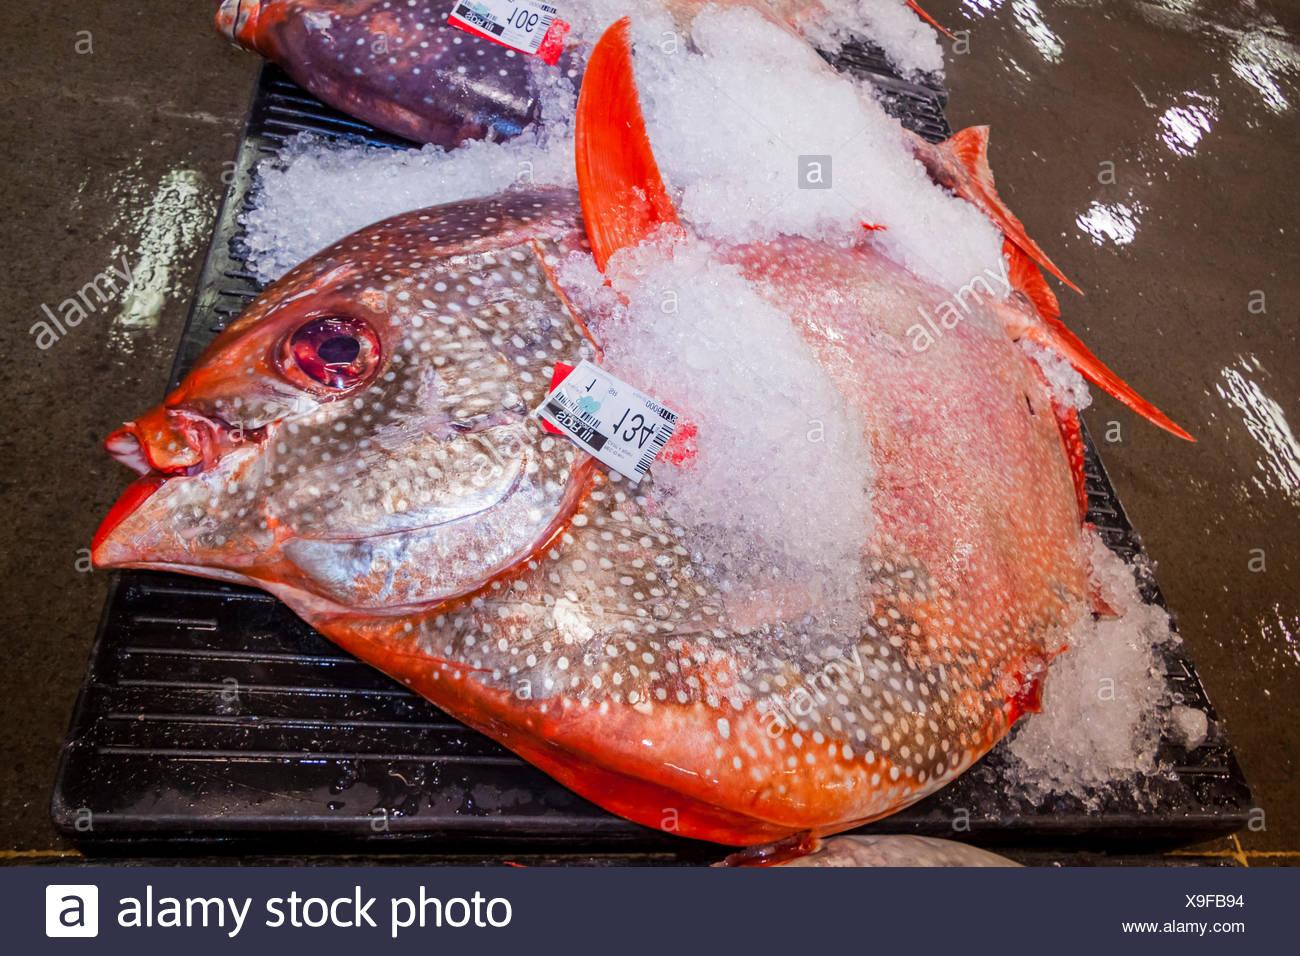 Moonfish at Fish Auction, Lampris guttatus, Hawaii, USA Stock Photo